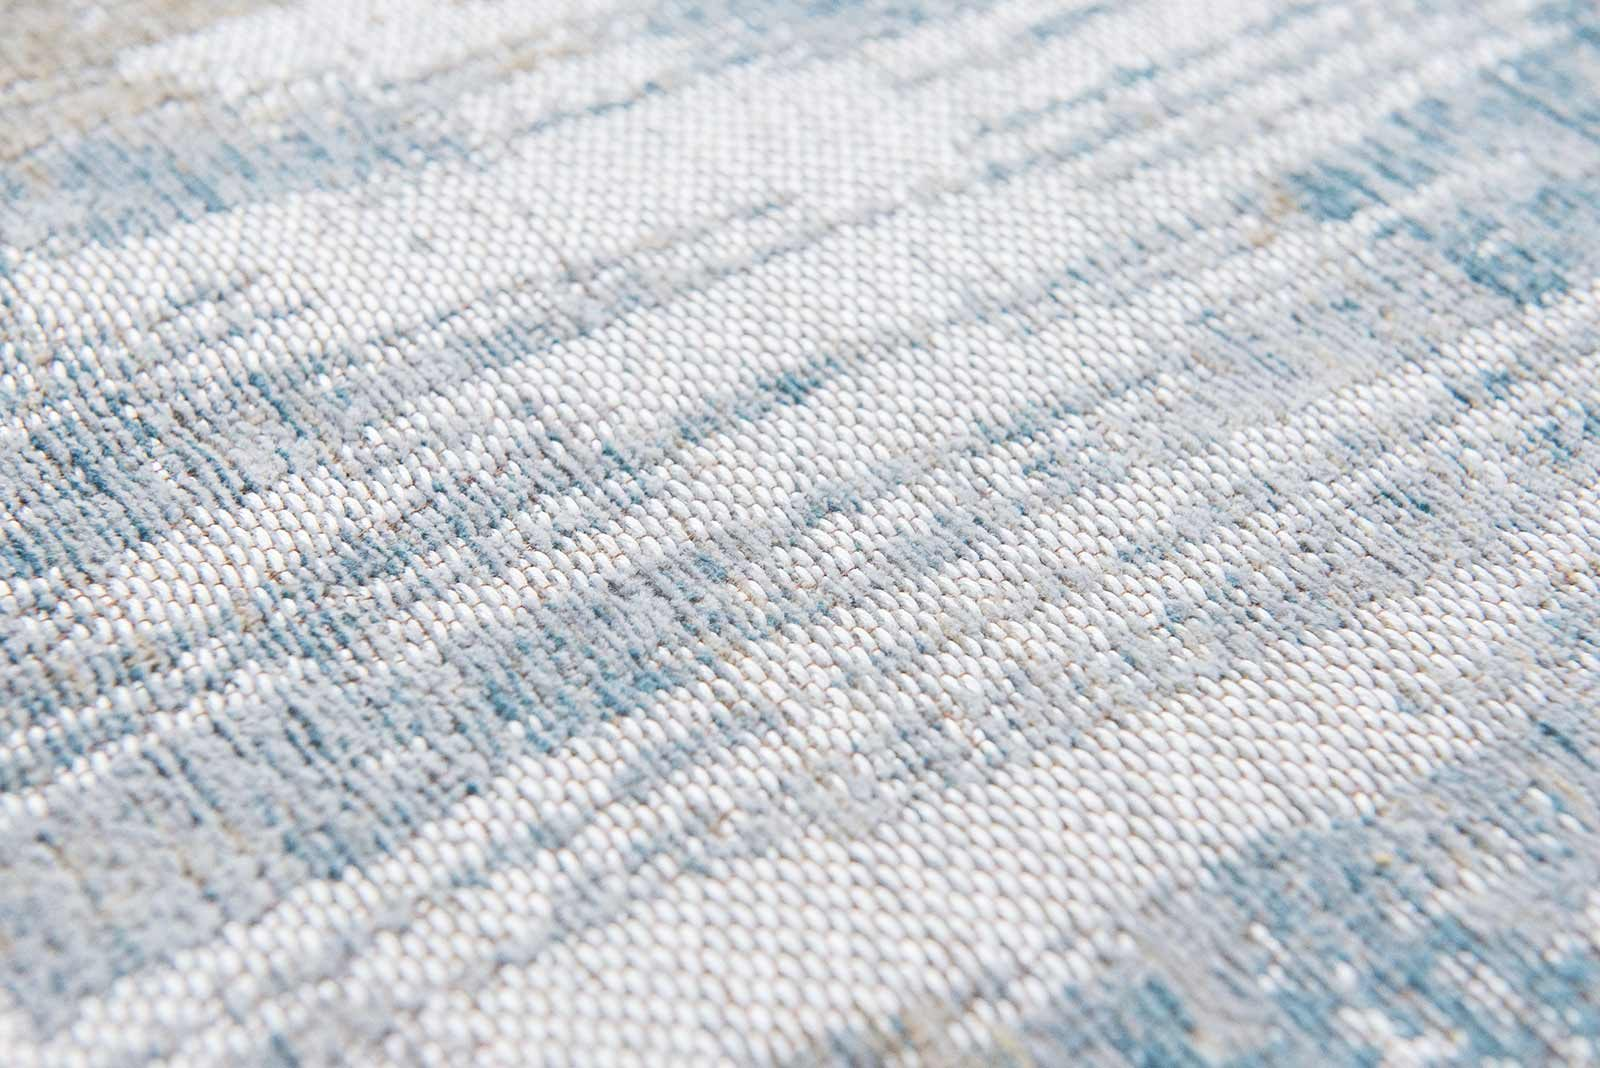 alfombras Louis De Poortere LX8718 Atlantic Streaks Long Island zoom 2